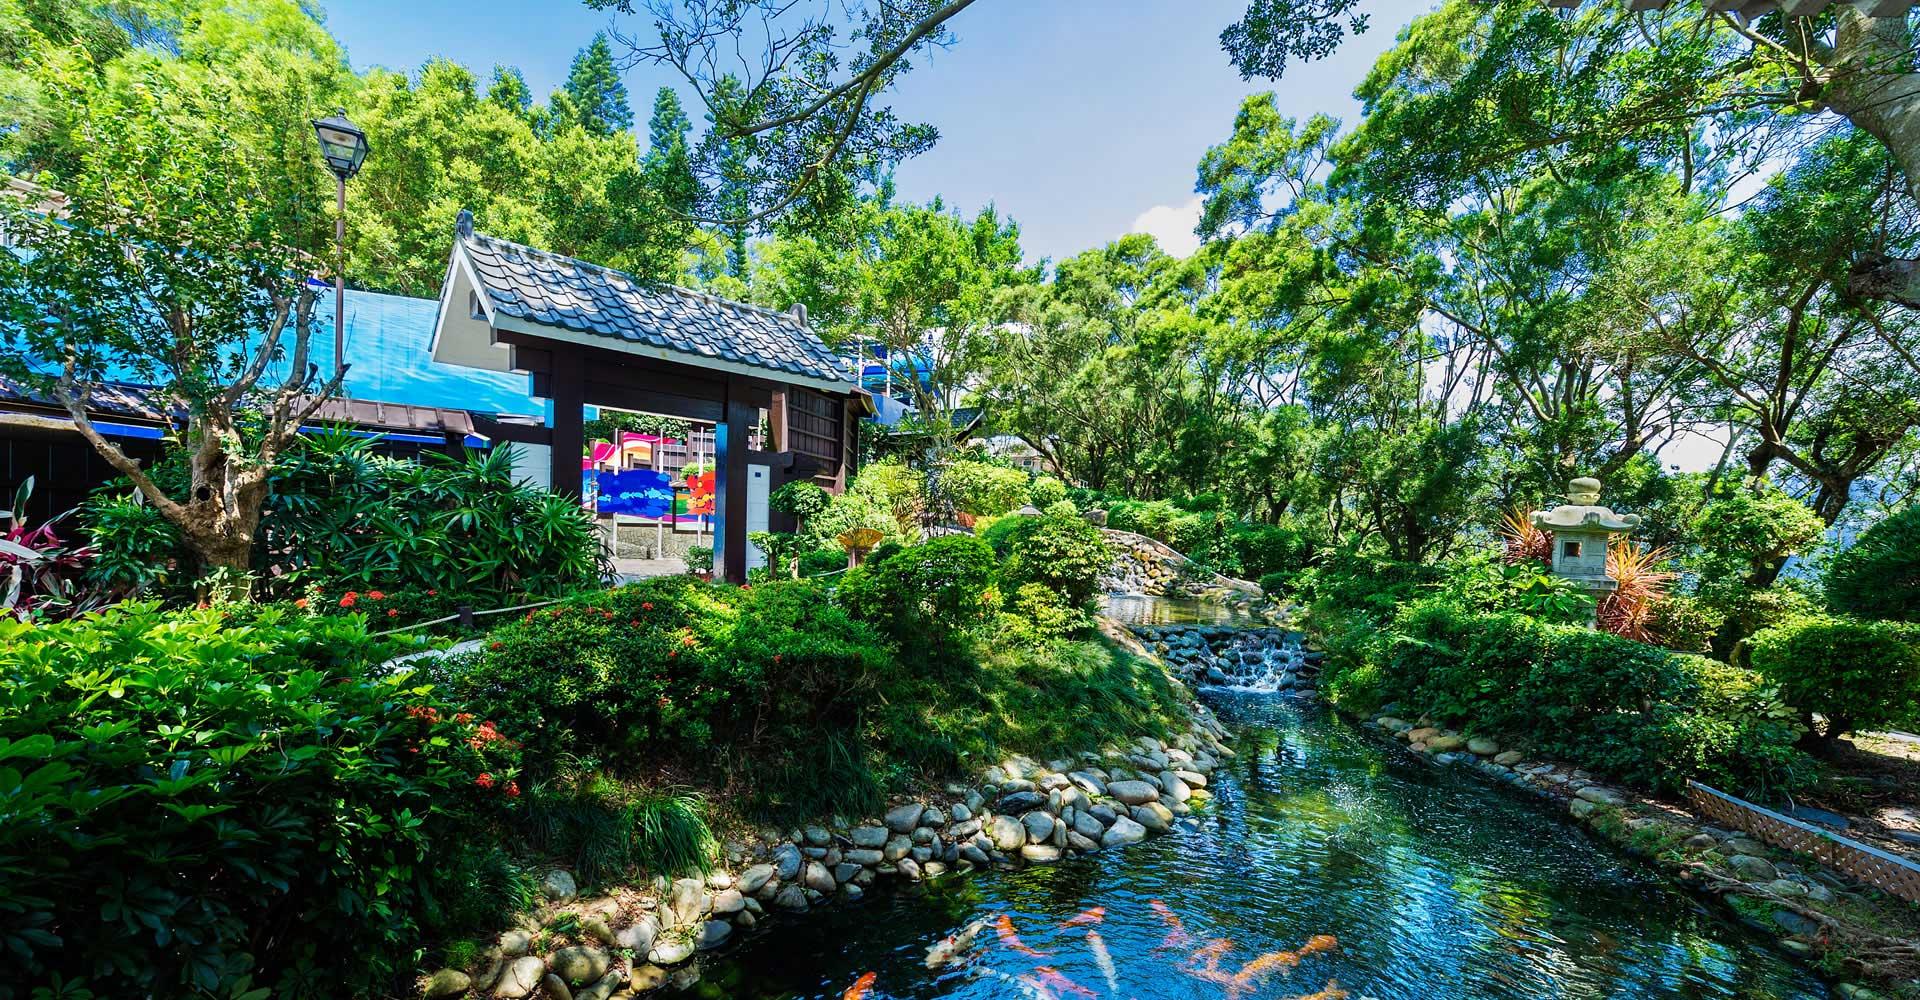 https://media.oceanpark.com.hk/files/s3fs-public/GardenOfJoy_02.jpg